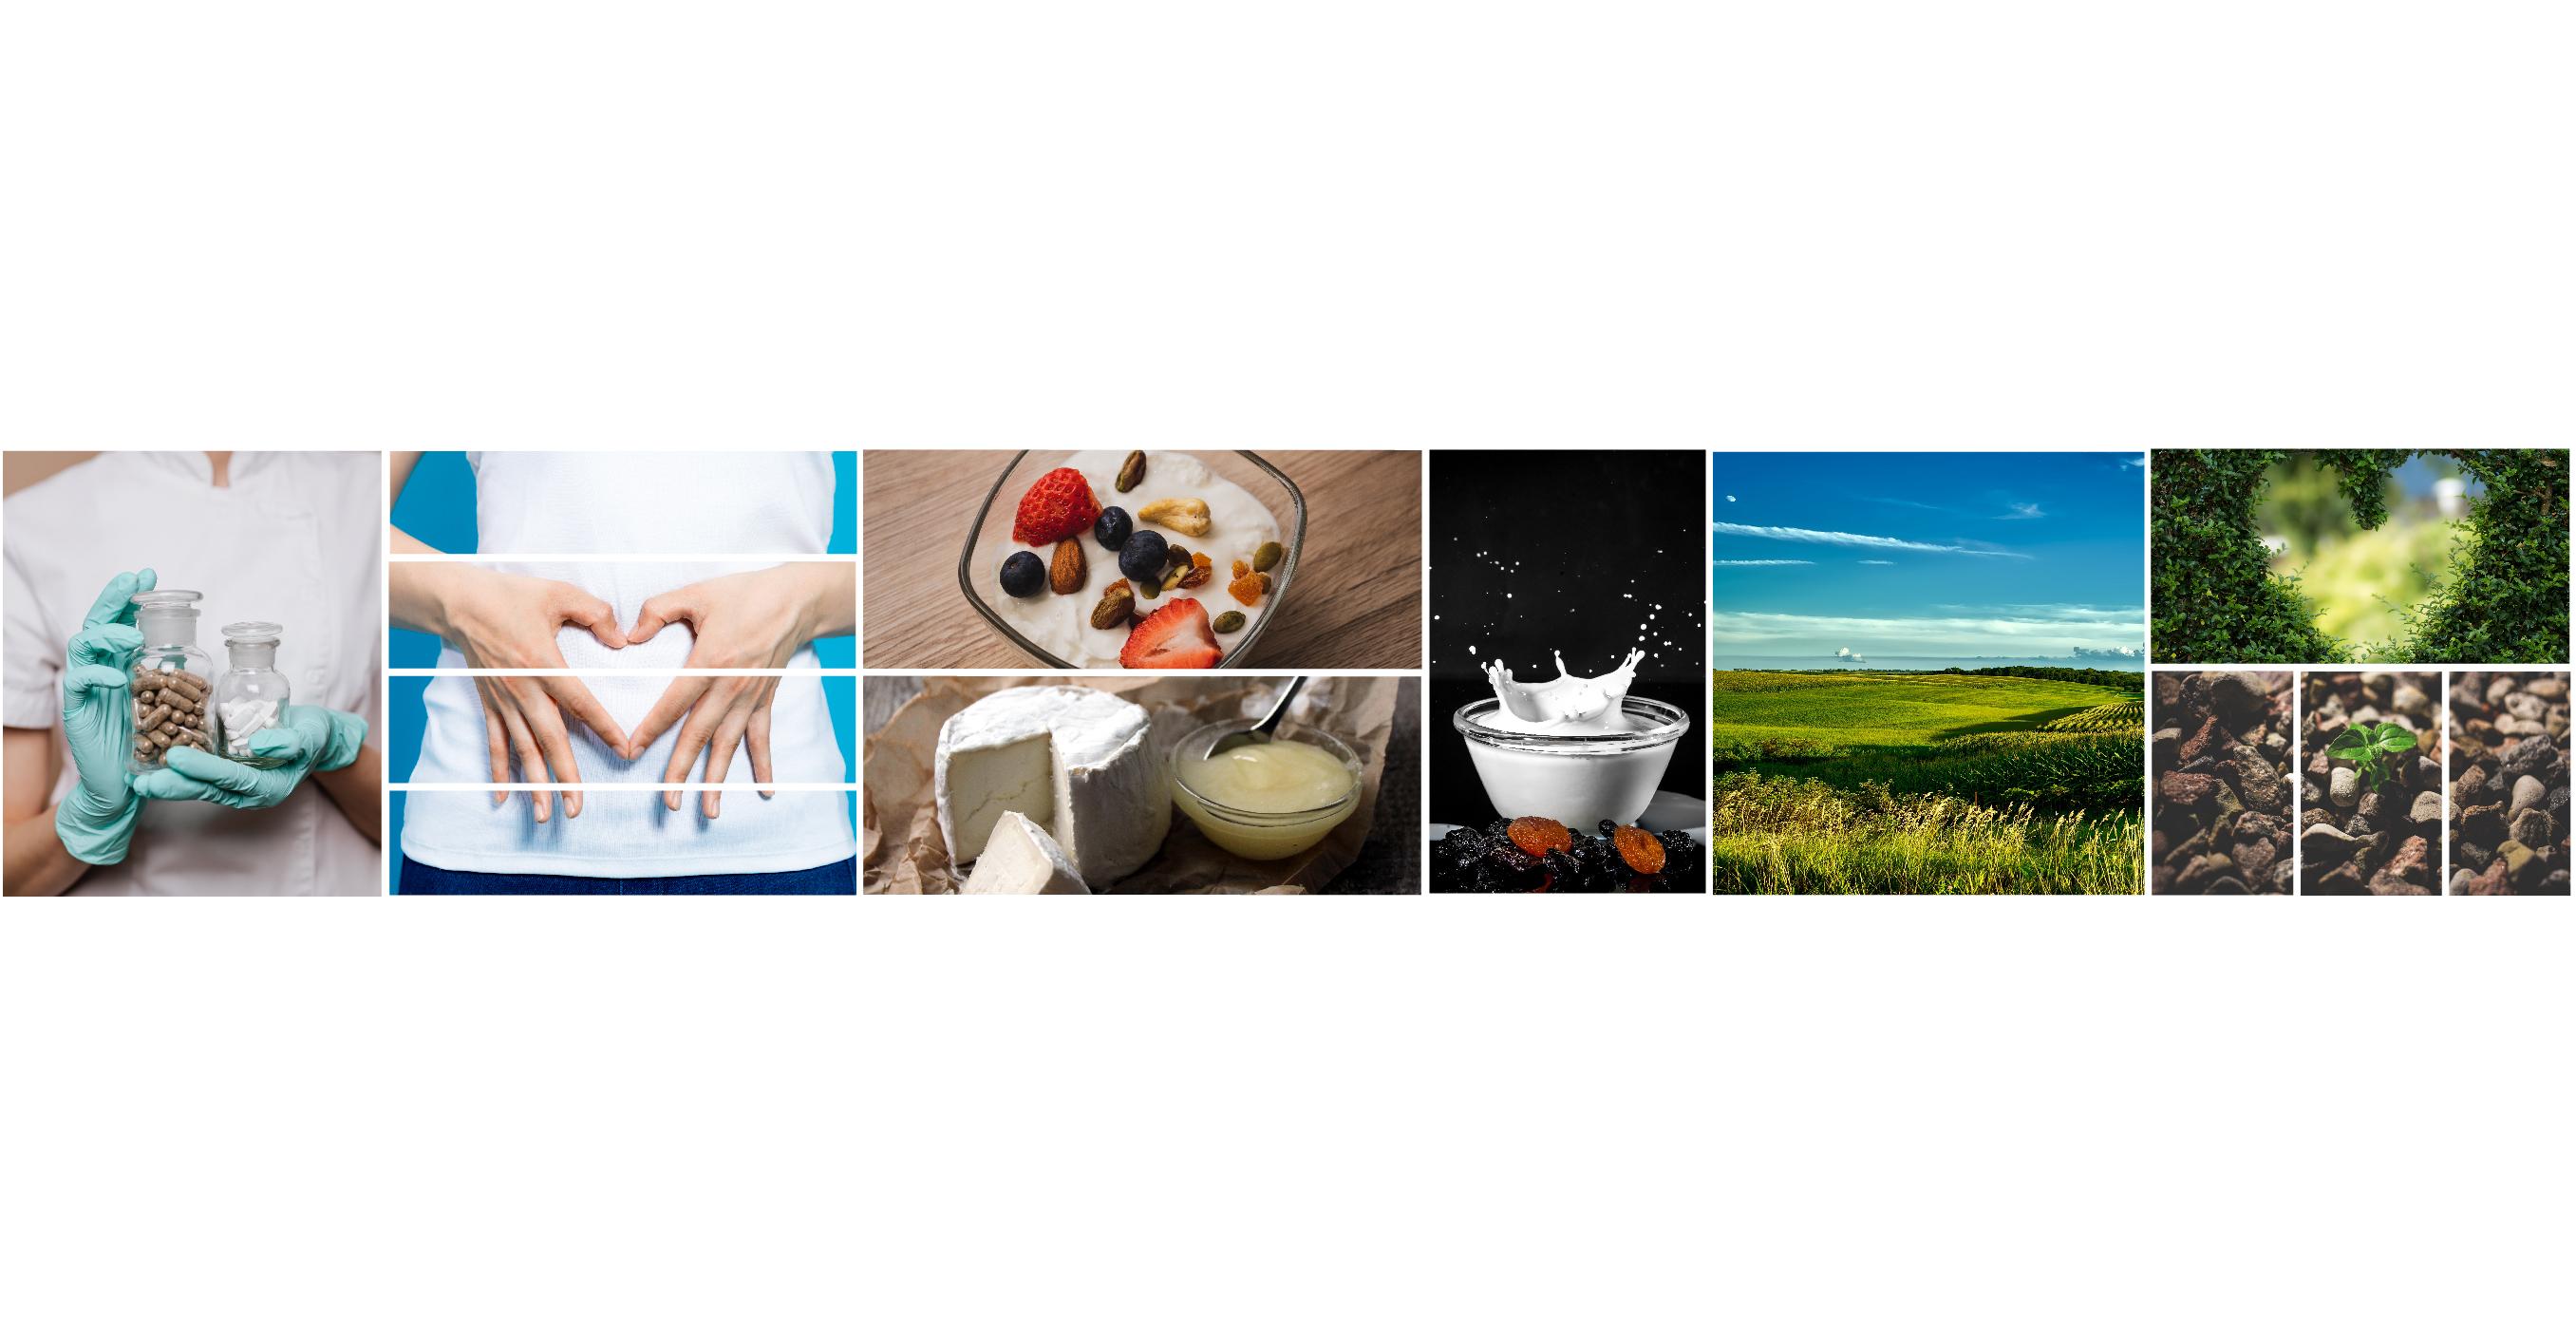 Proxis-Developpement-groupe-industriel-francais-contact-bioprox